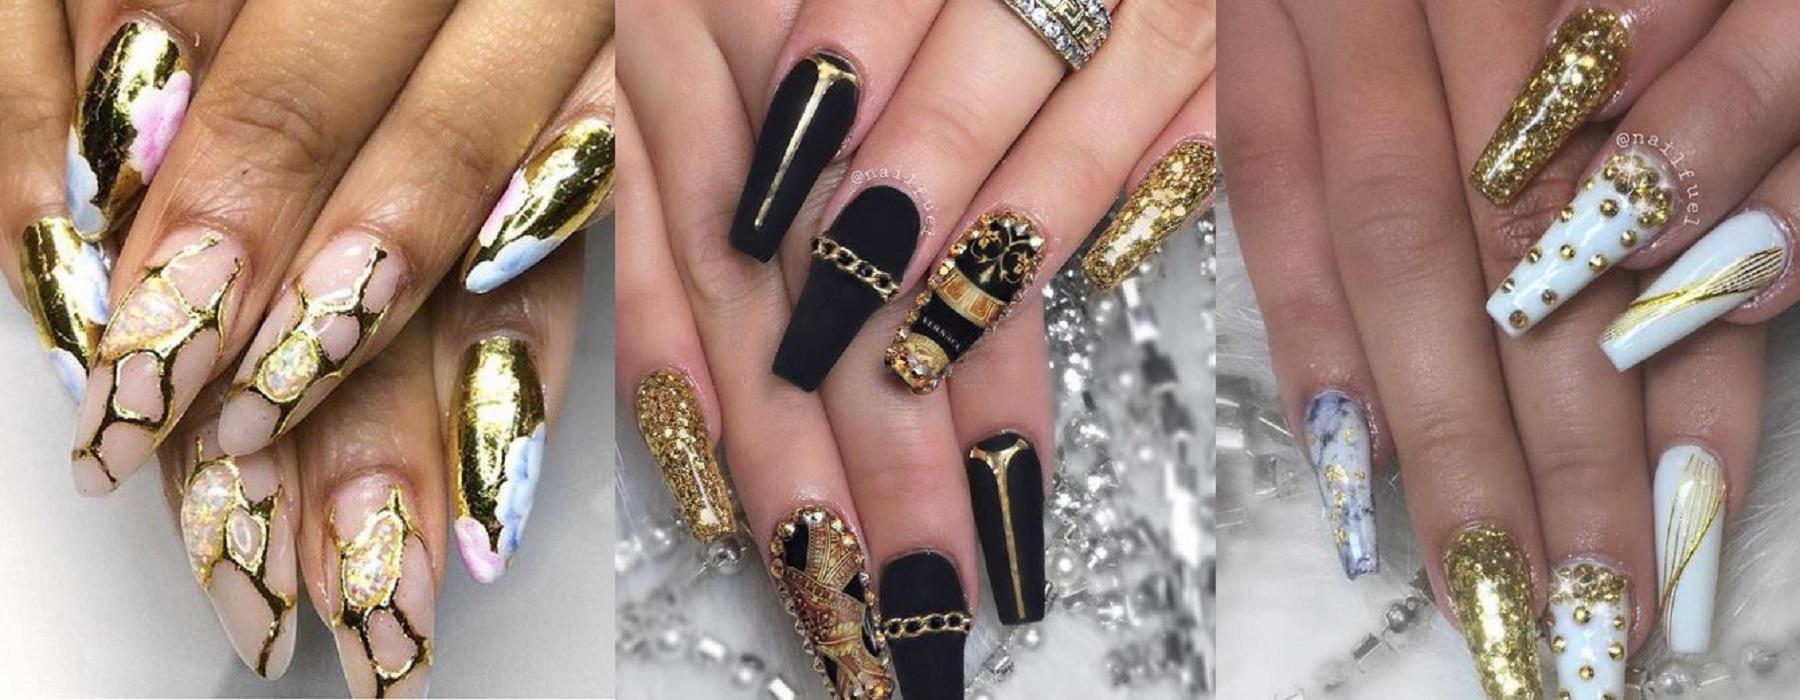 Artistic Gold Nail Art